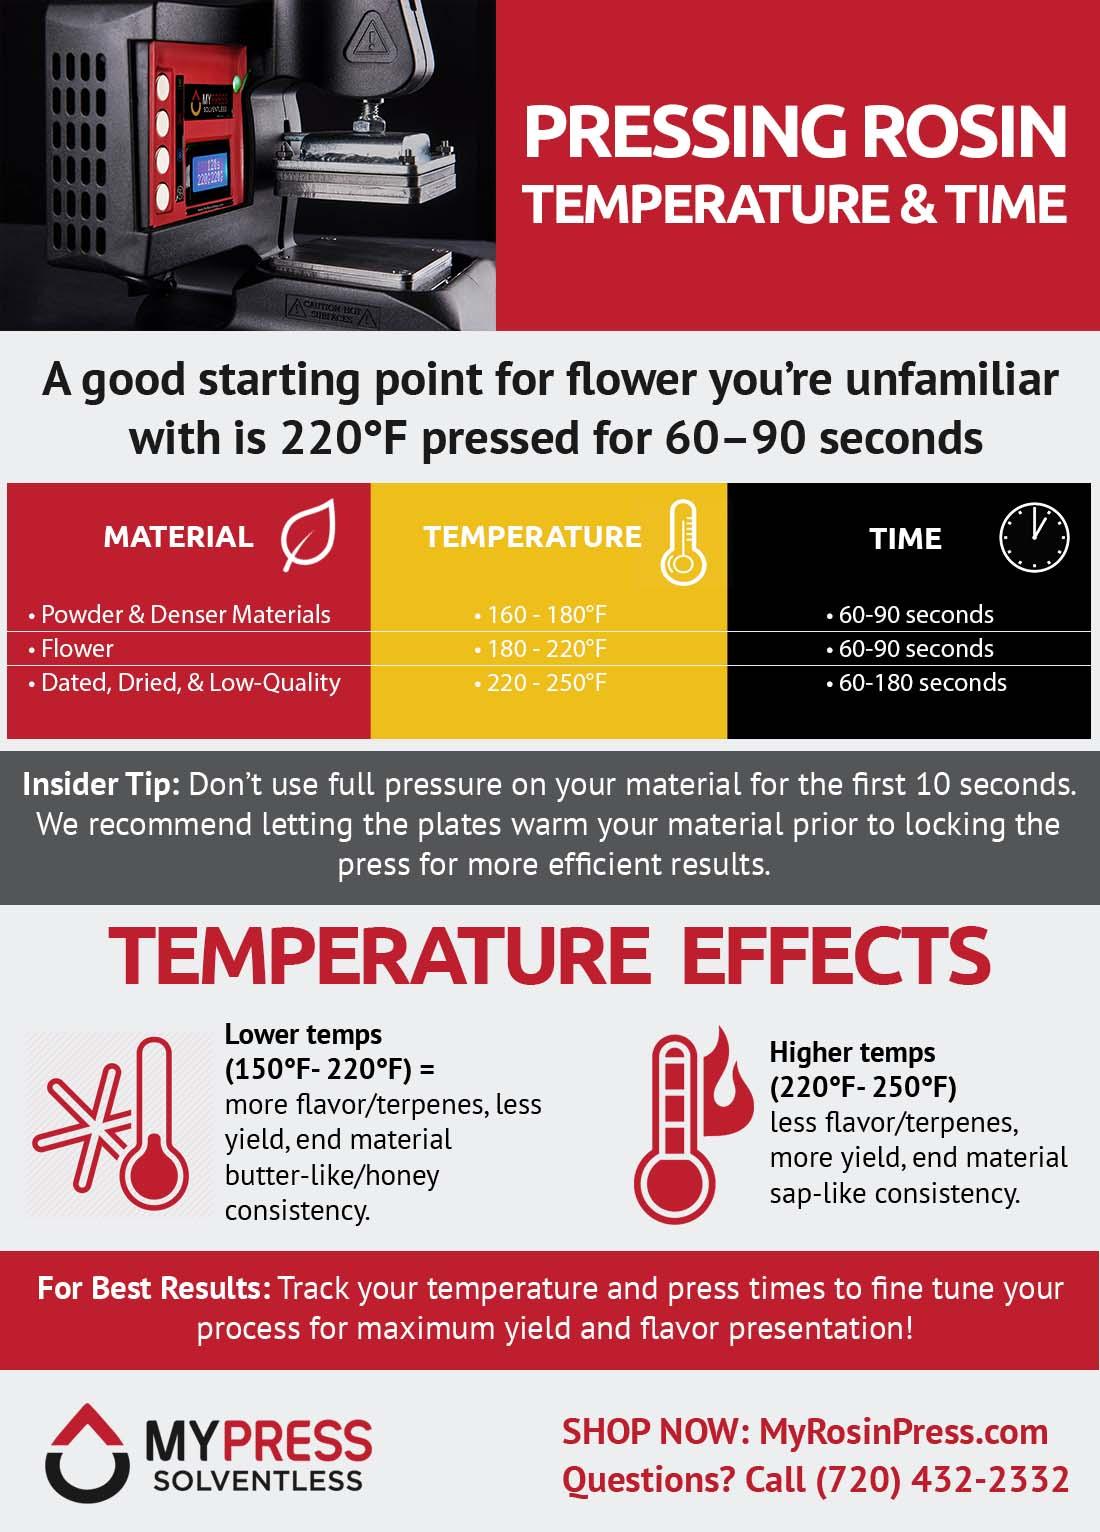 Pressing Rosin Infographic